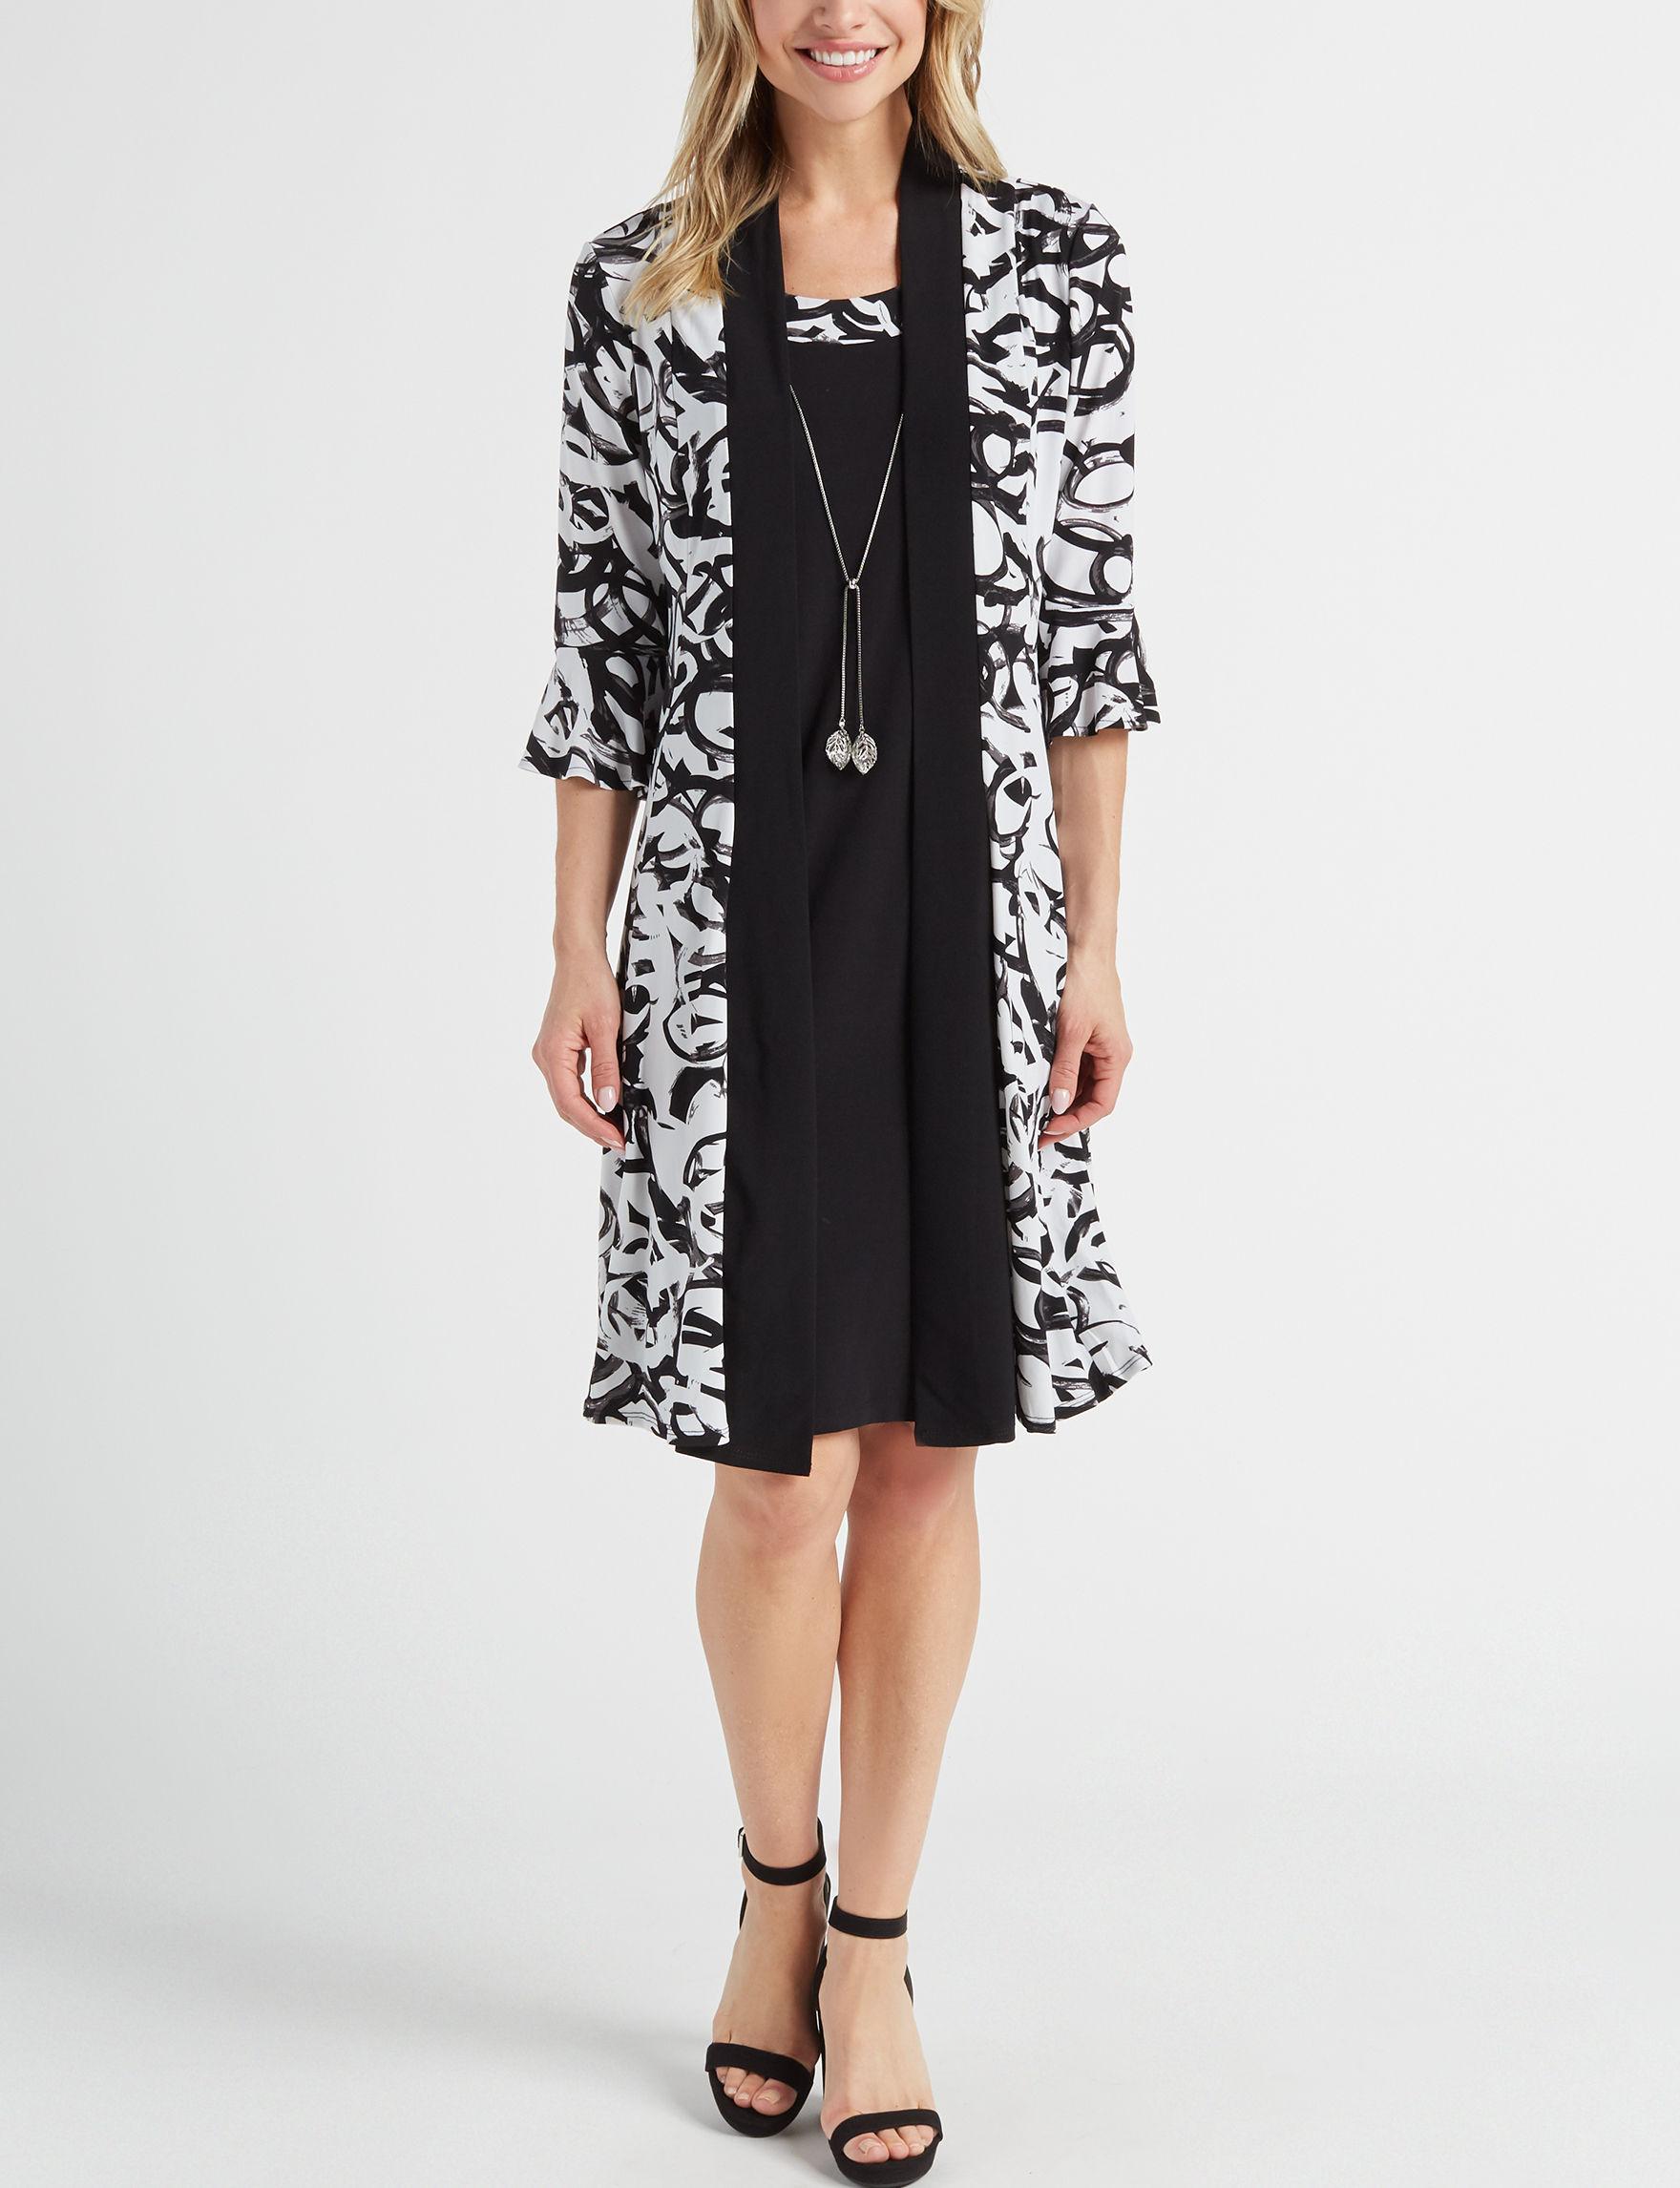 R & M Richards White / Black Everyday & Casual Jacket Dresses